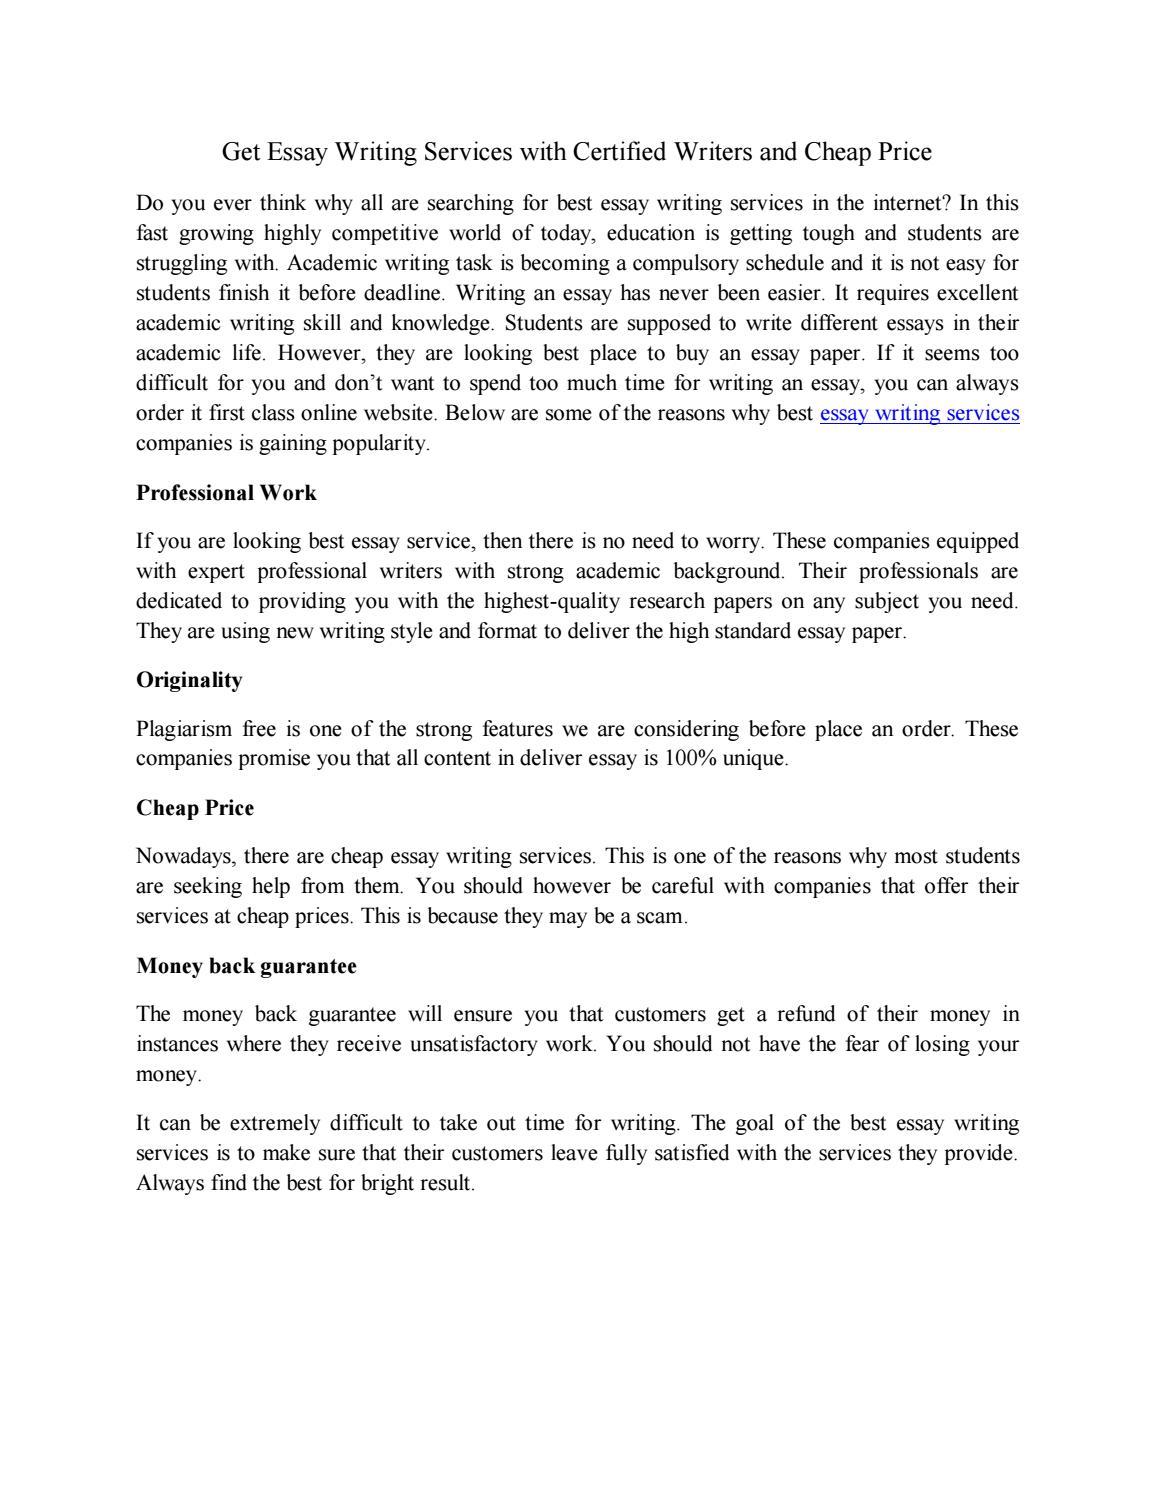 academic background essay spse academic essays reading